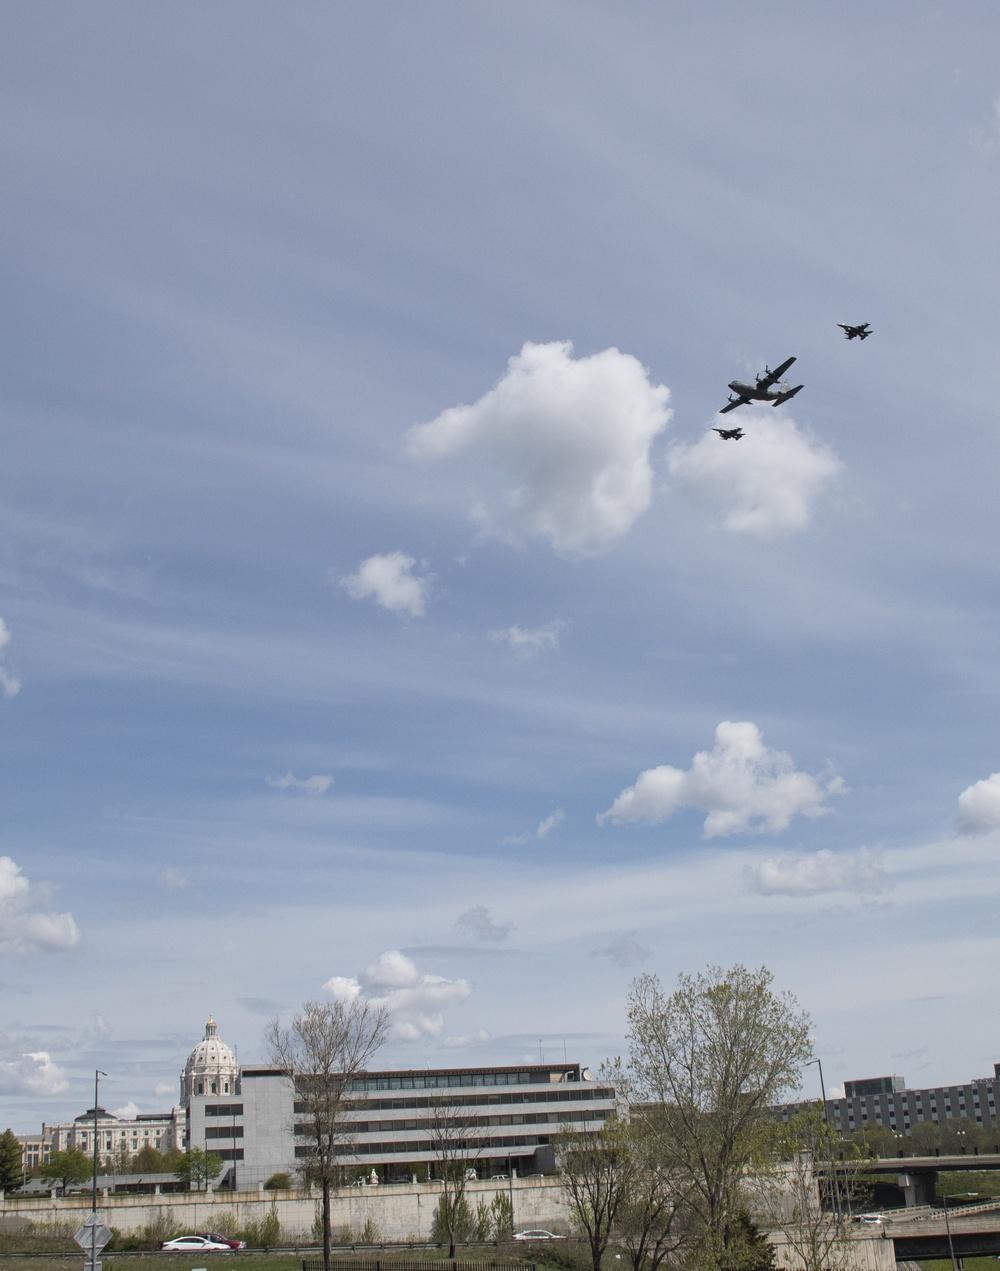 Operation American Resolve Minnesota flyovers